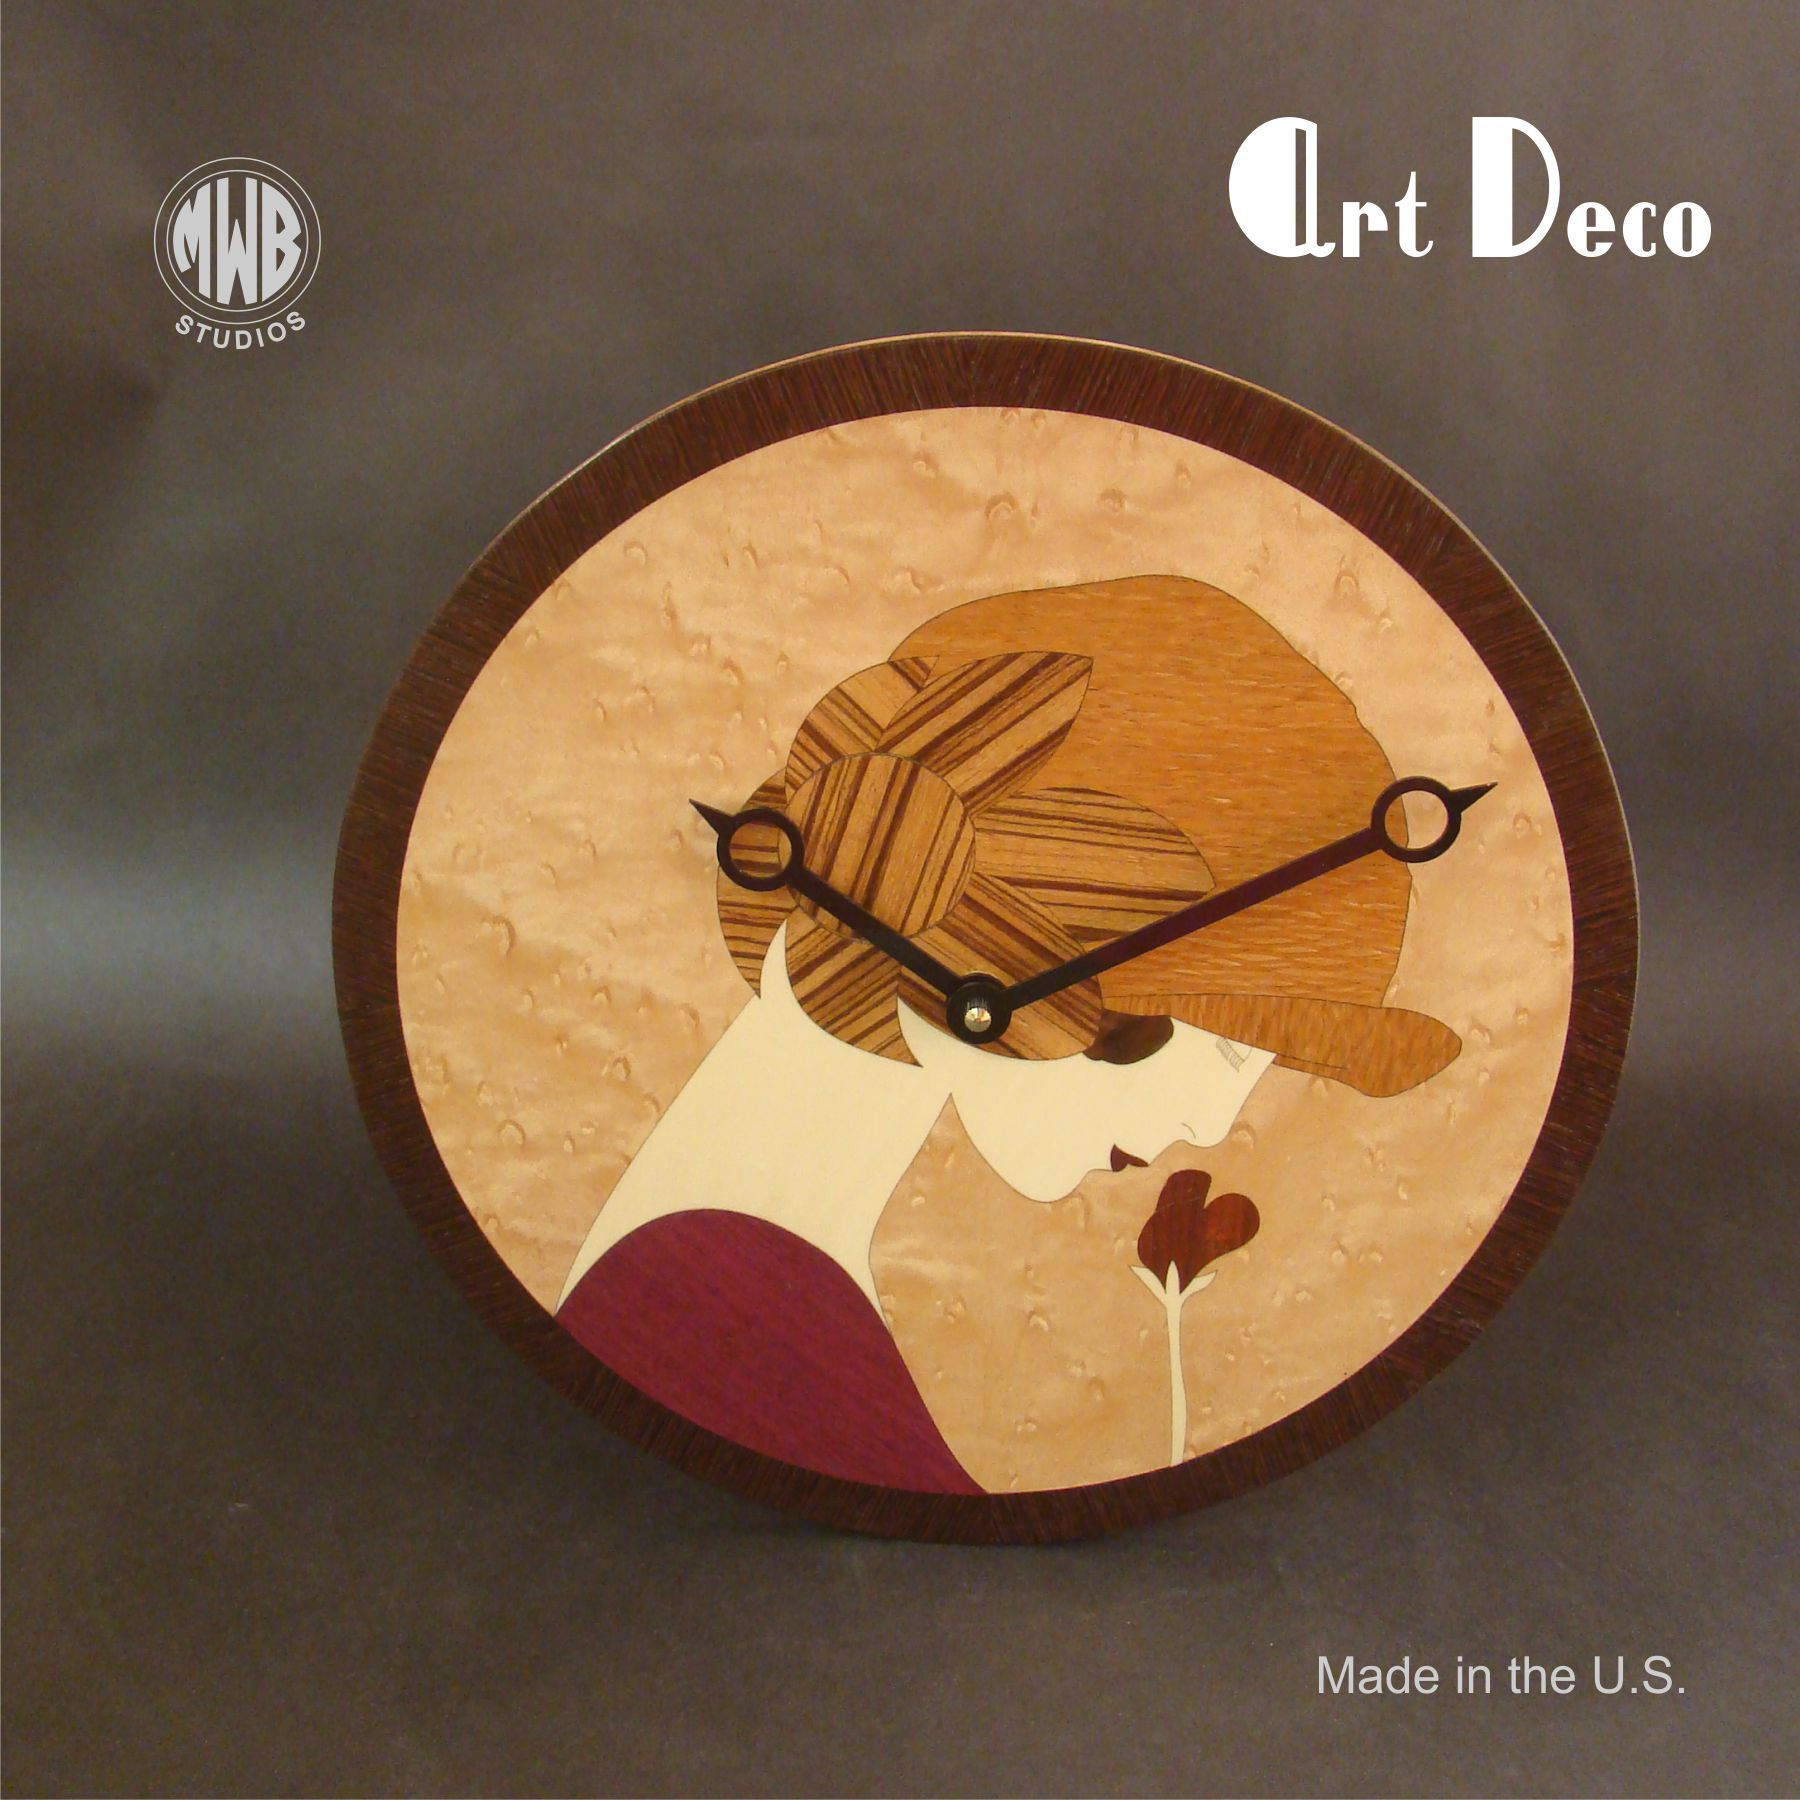 Lovable Inlaid Buy A Custom Art Deco Styled Wall Clock Made Inlaid Art Deco Clock Hands Art Deco Clocks Facts Custom Made Art Deco Styled Wall Clock Made houzz 01 Art Deco Clock